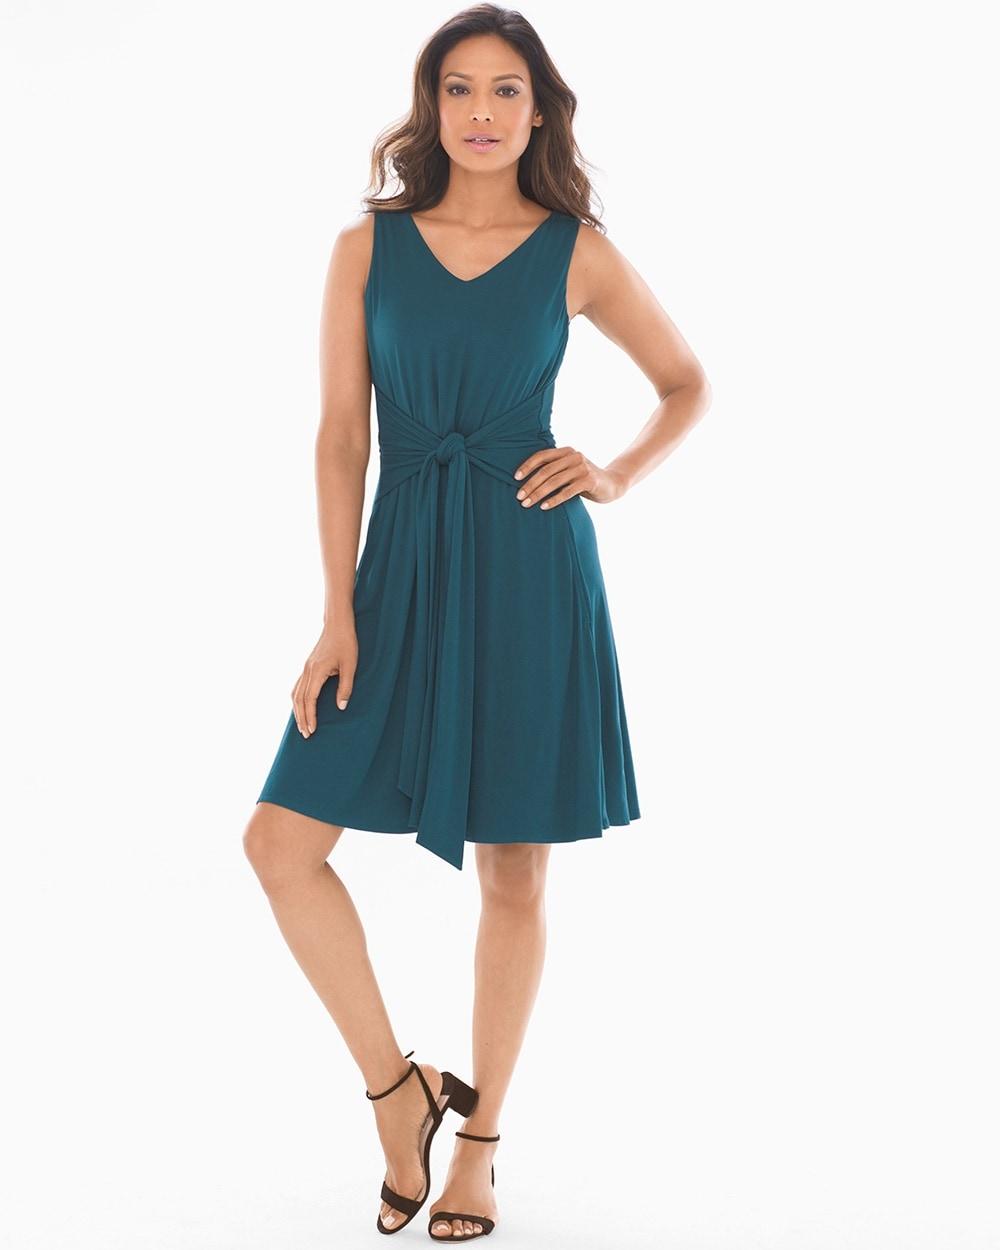 81770c53ccf76 Soft Jersey Sleeveless Knot Front Dress Dark Harbour - Soma